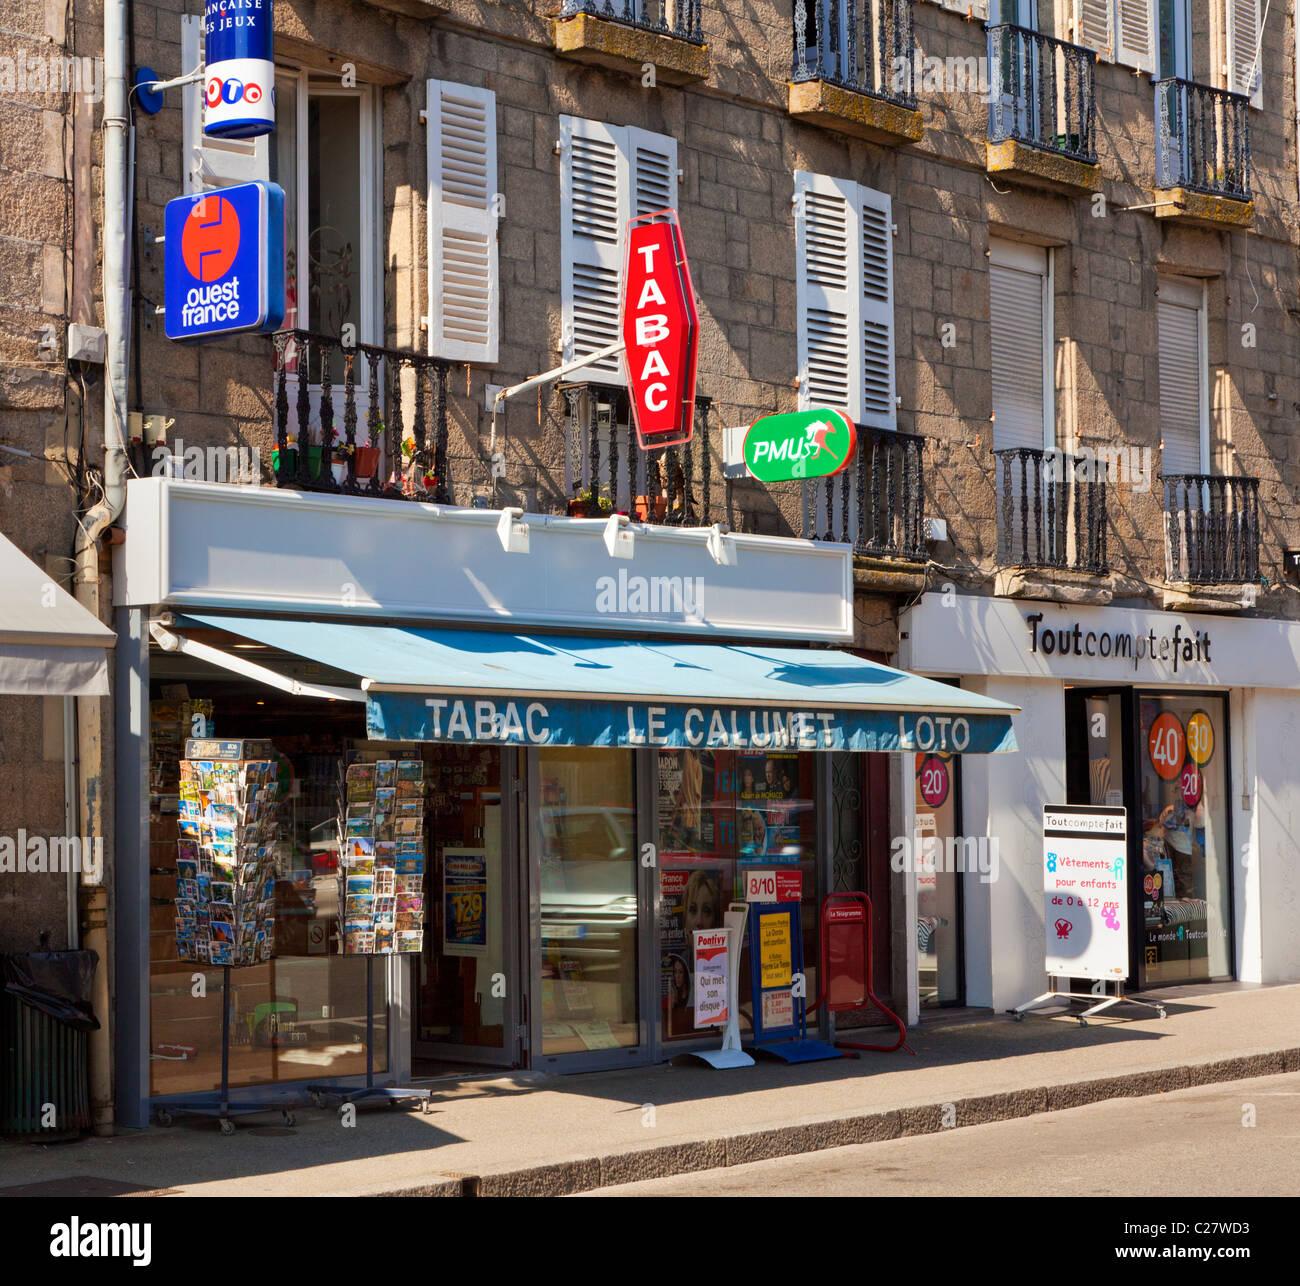 Tabac store on the main street in Pontivy, Morbihan